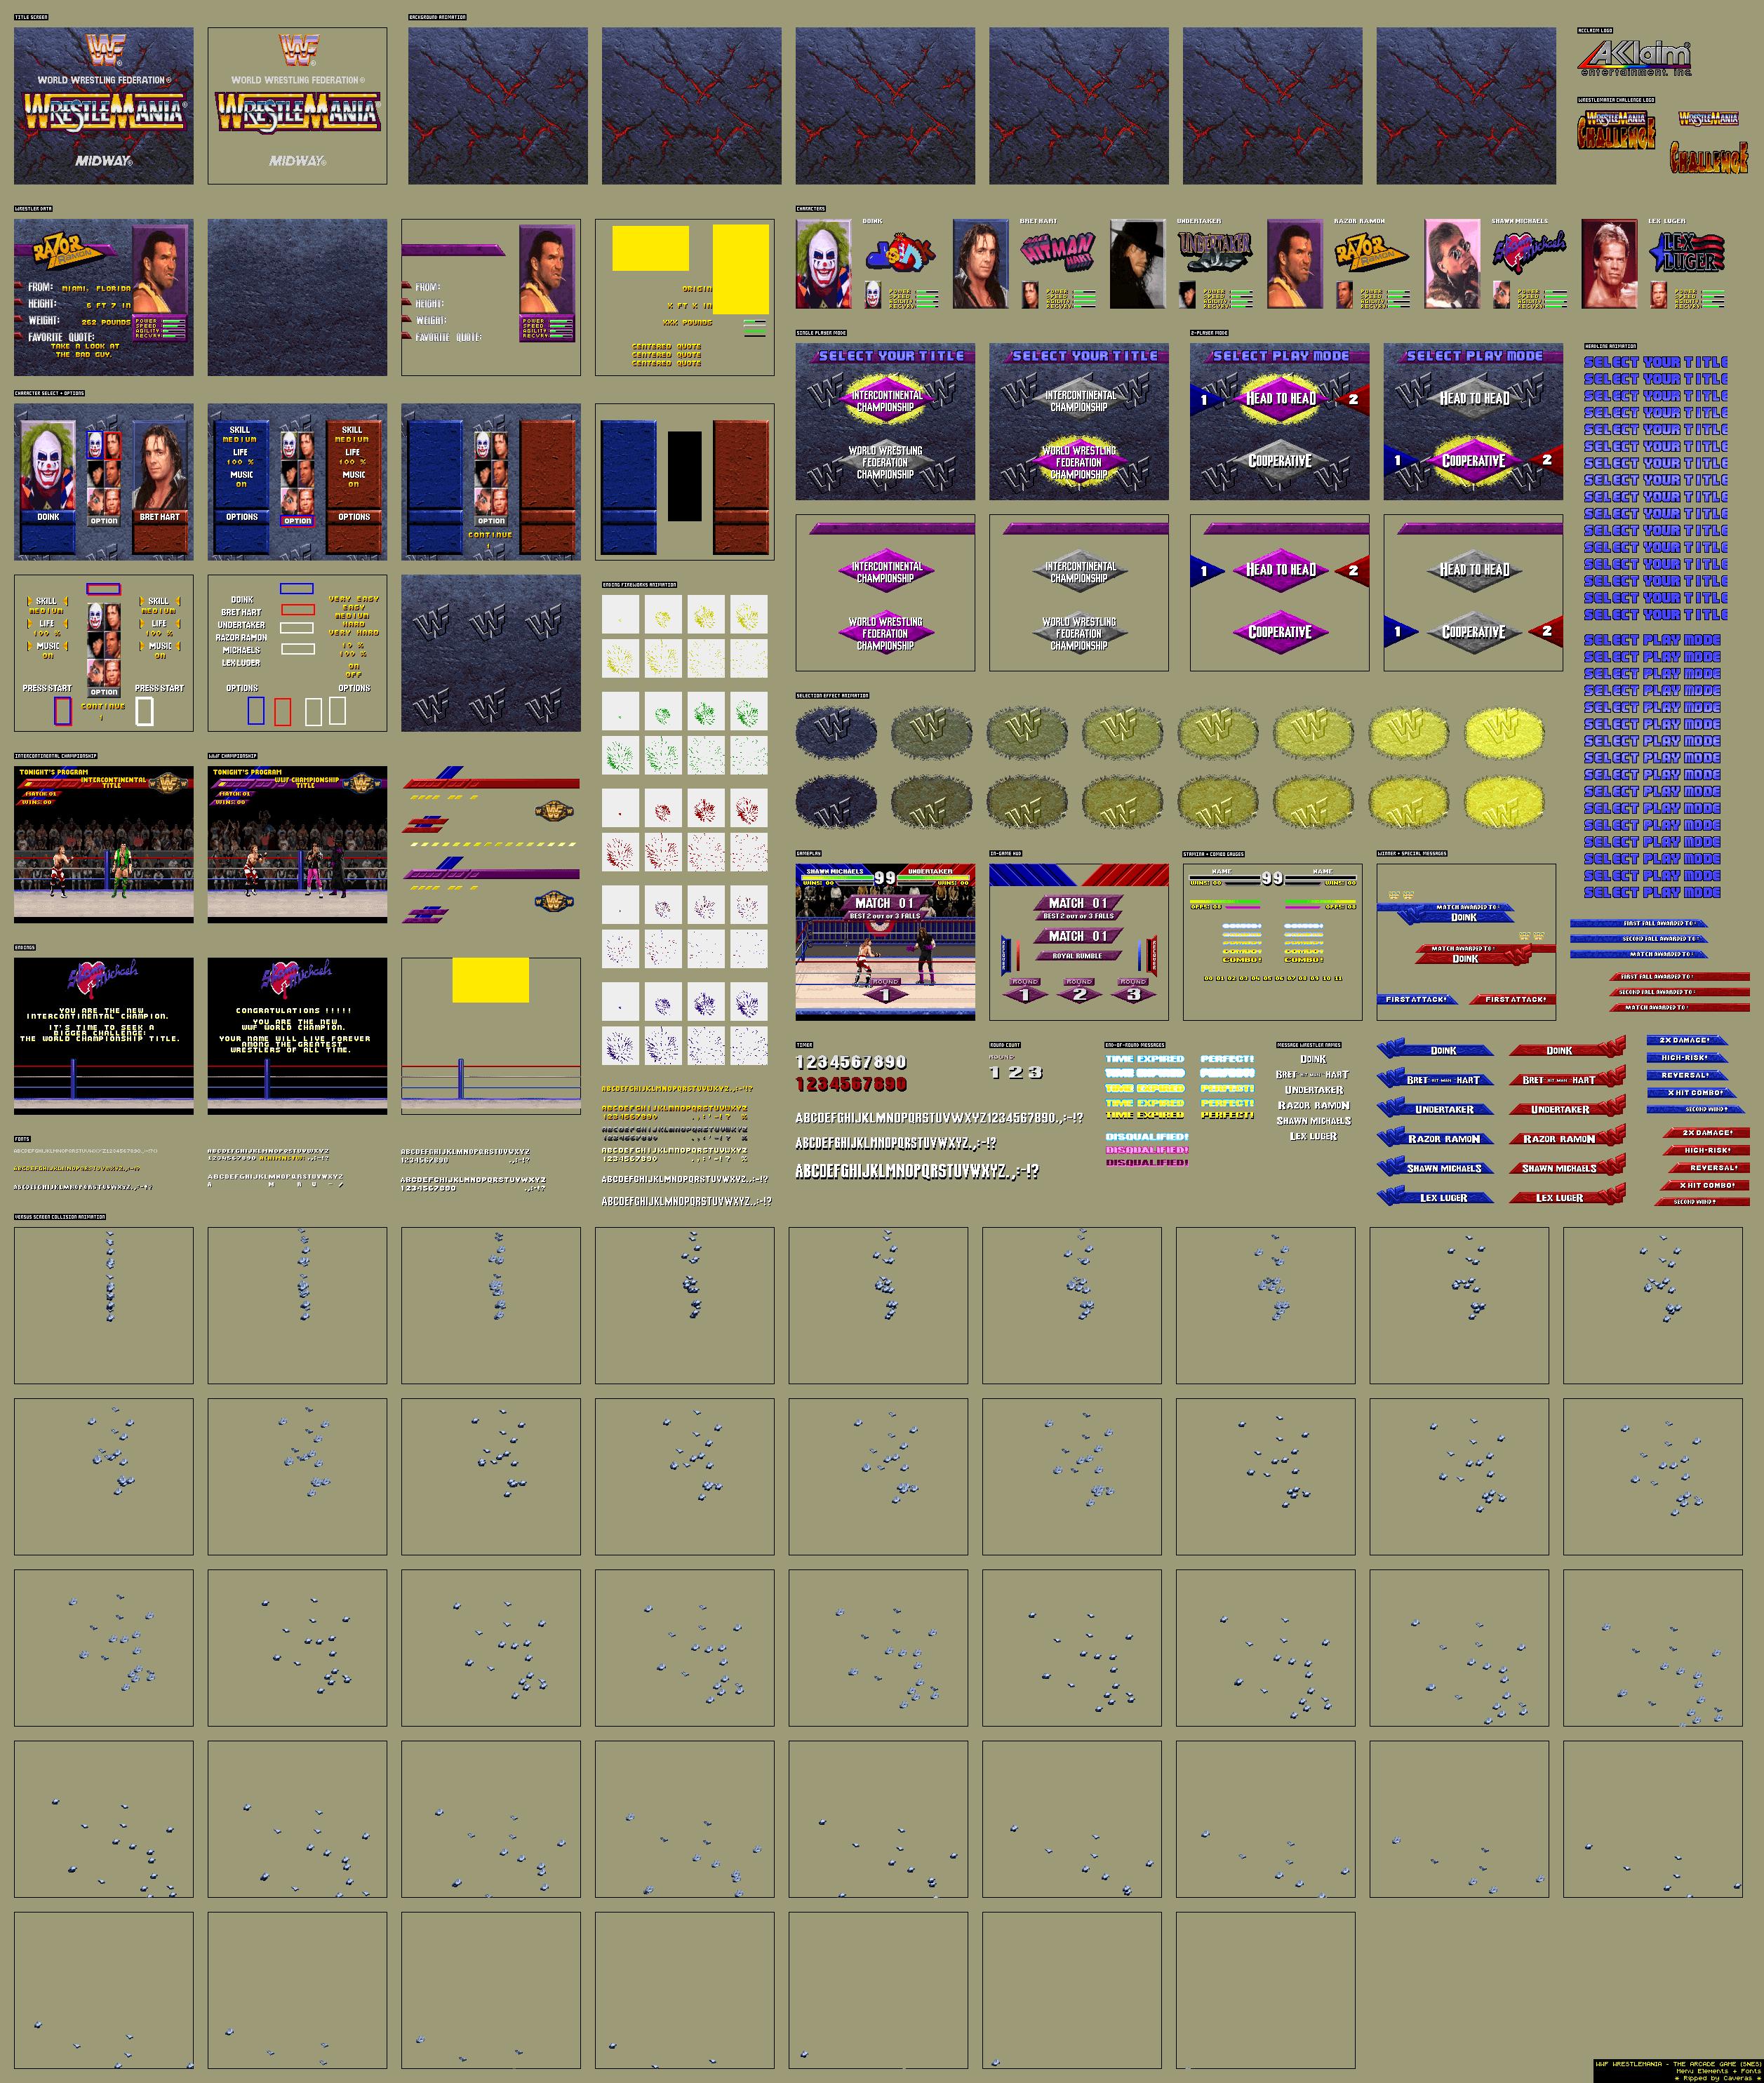 WWF WrestleMania: The Arcade Game - Menu Elements + Fonts | KOC